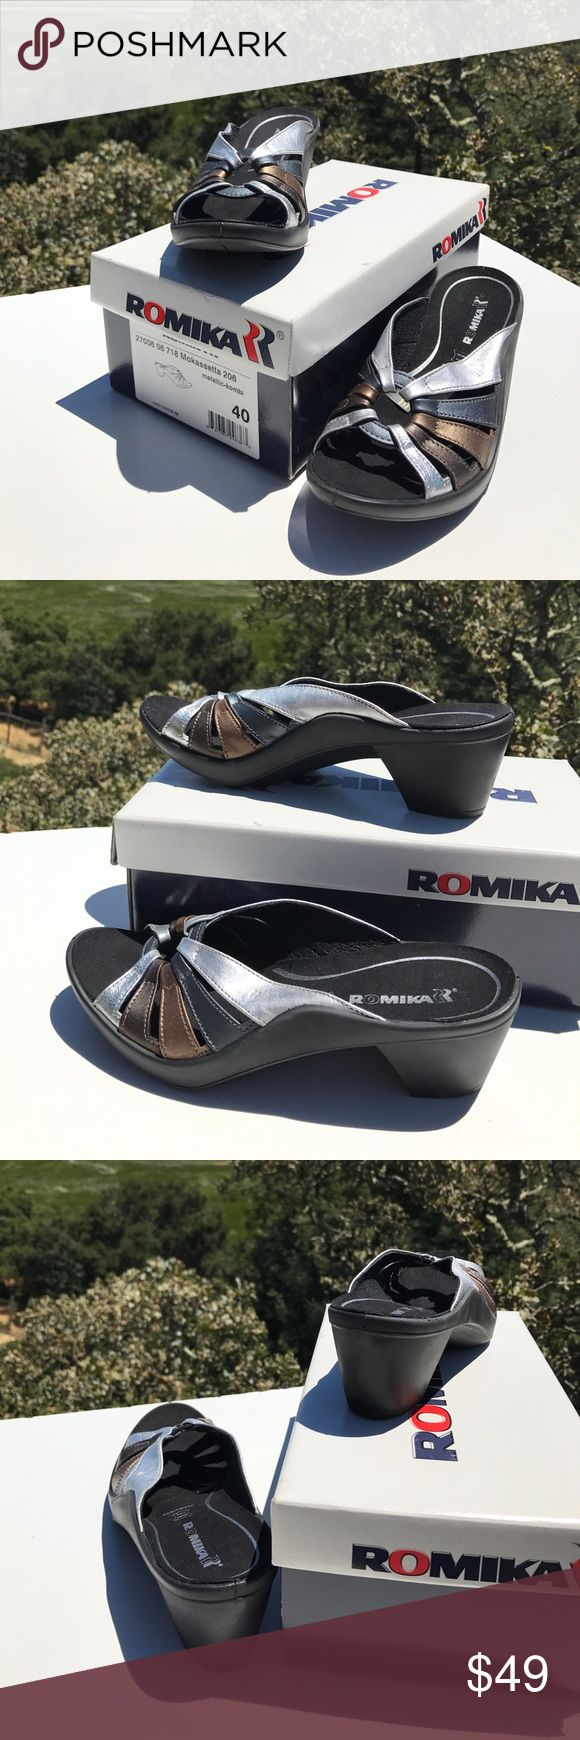 "Romika Mokasseta Metallic Slides Sandals Wedges 40 Hardly worn if ever.  2.5"" heels. Romika Shoes Sandals"